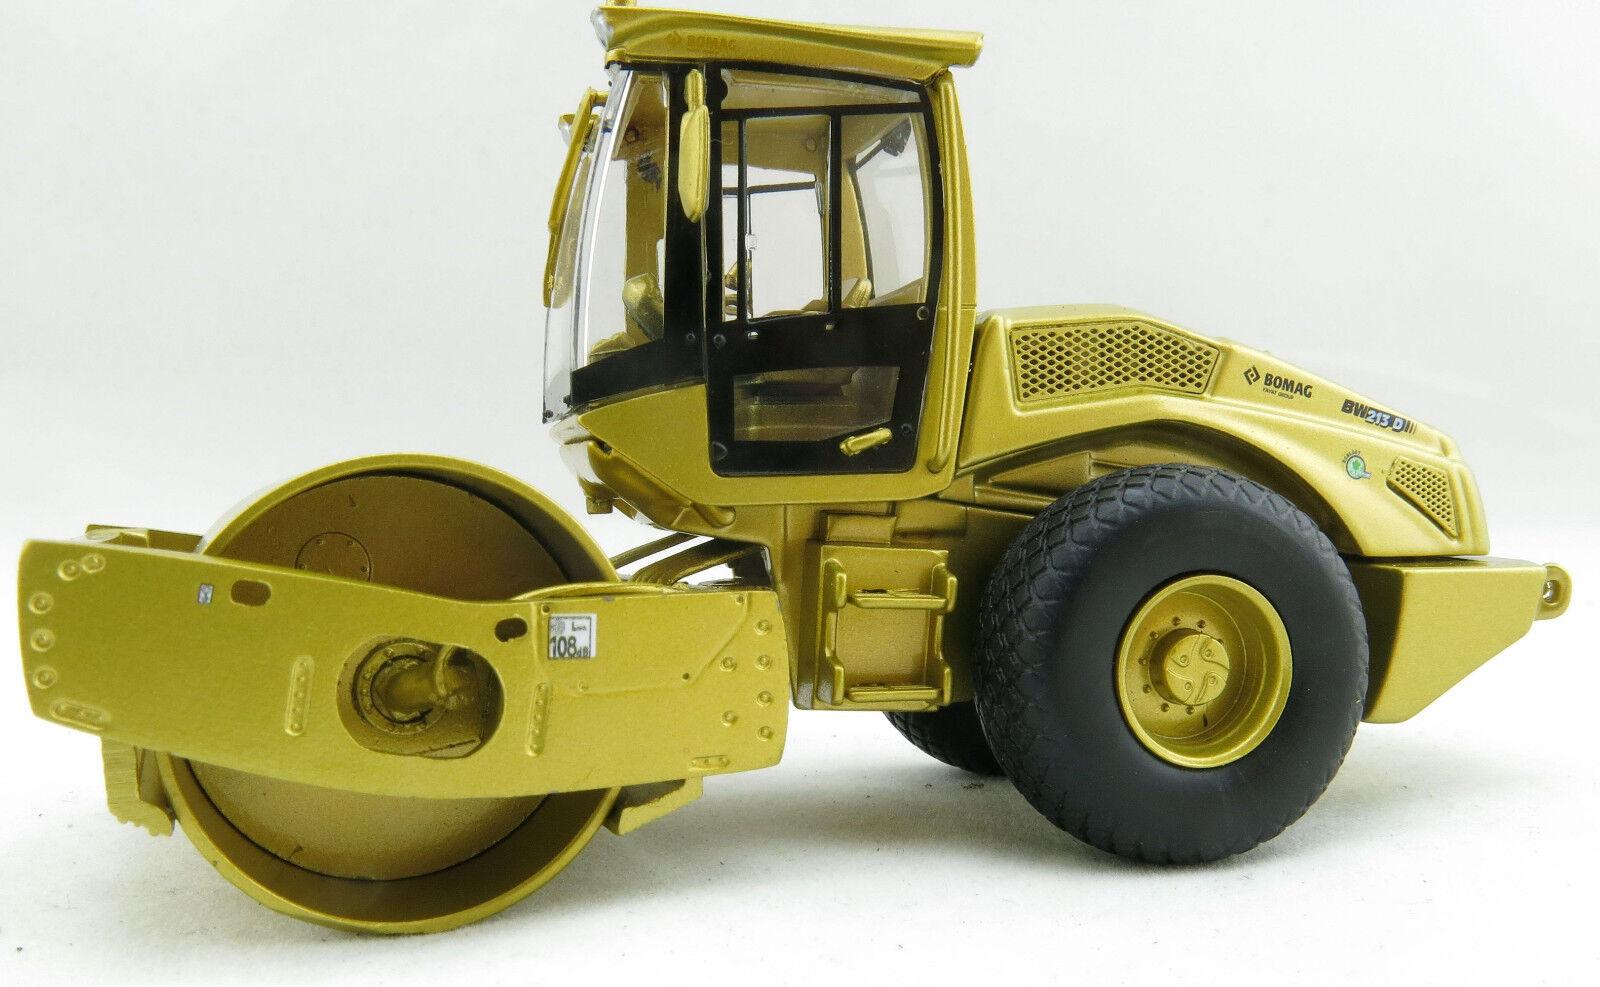 Kaster Scale Models K213 gold BW 213 D-5 SINGLE DRUM ROLLER Limited Edition 1 50